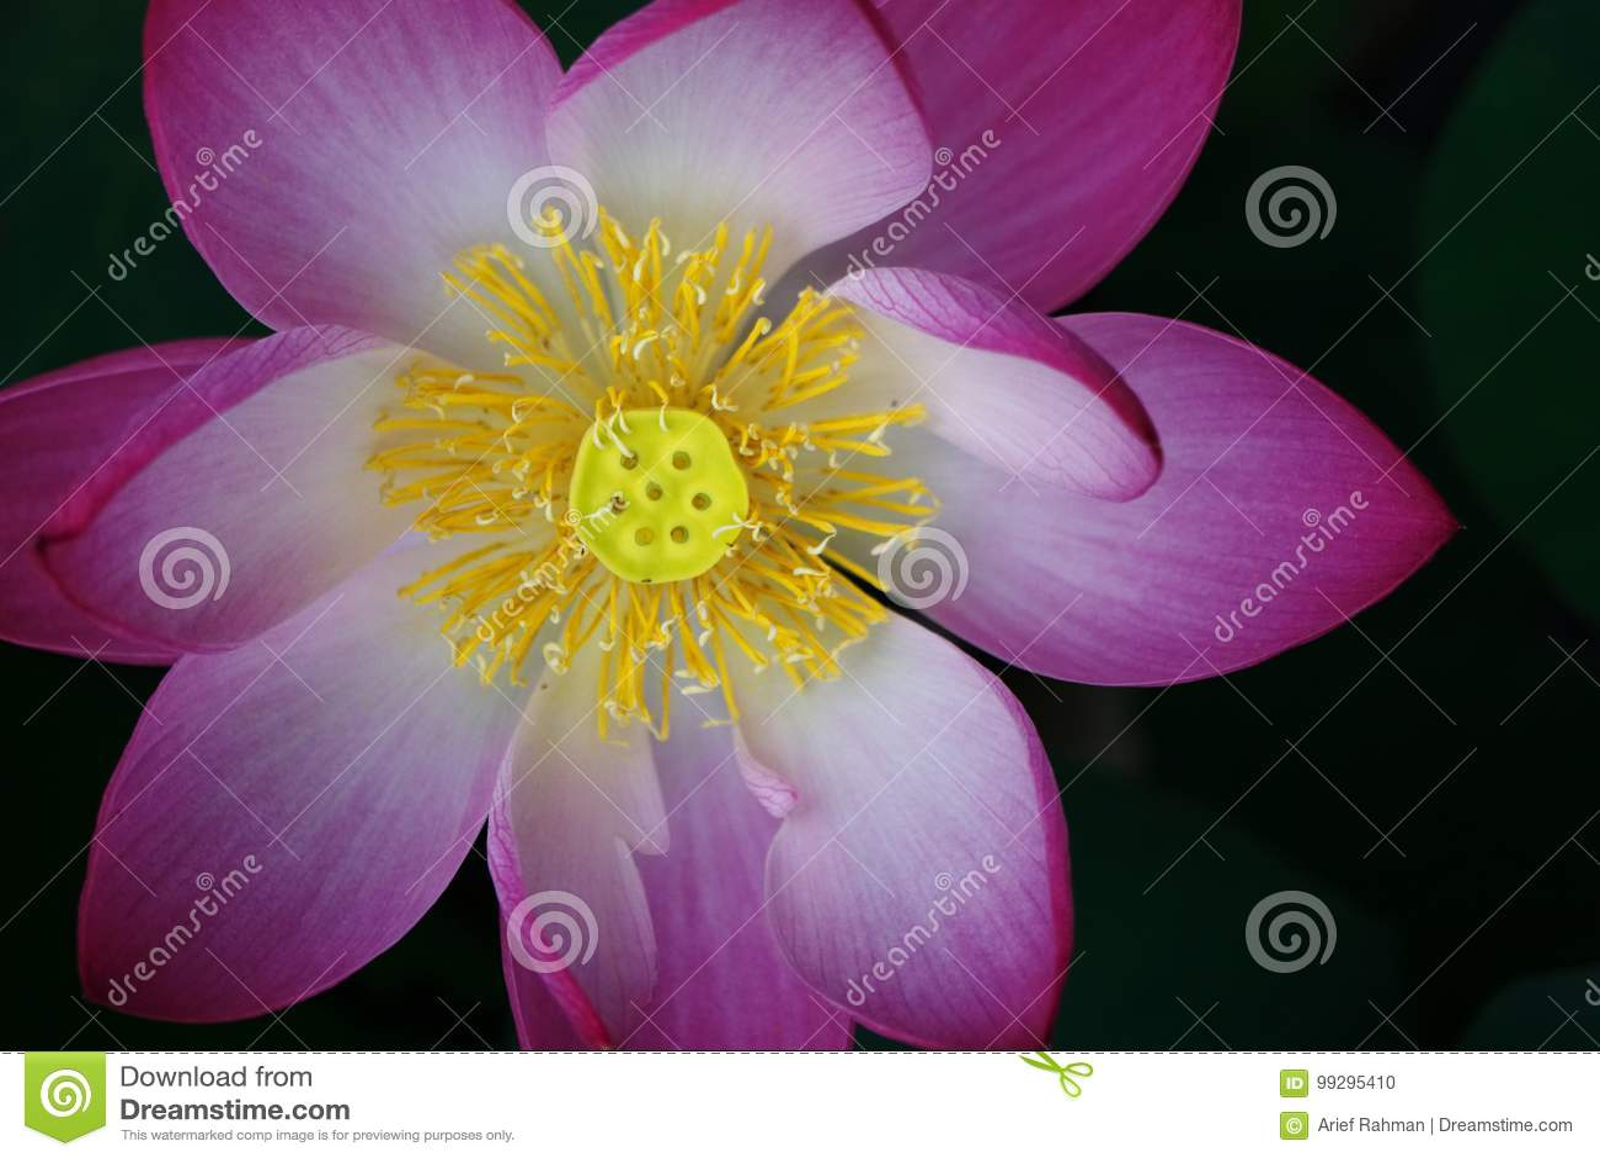 Lotus Flower Petal Stock Photo Image Of Plant Flora 99295410